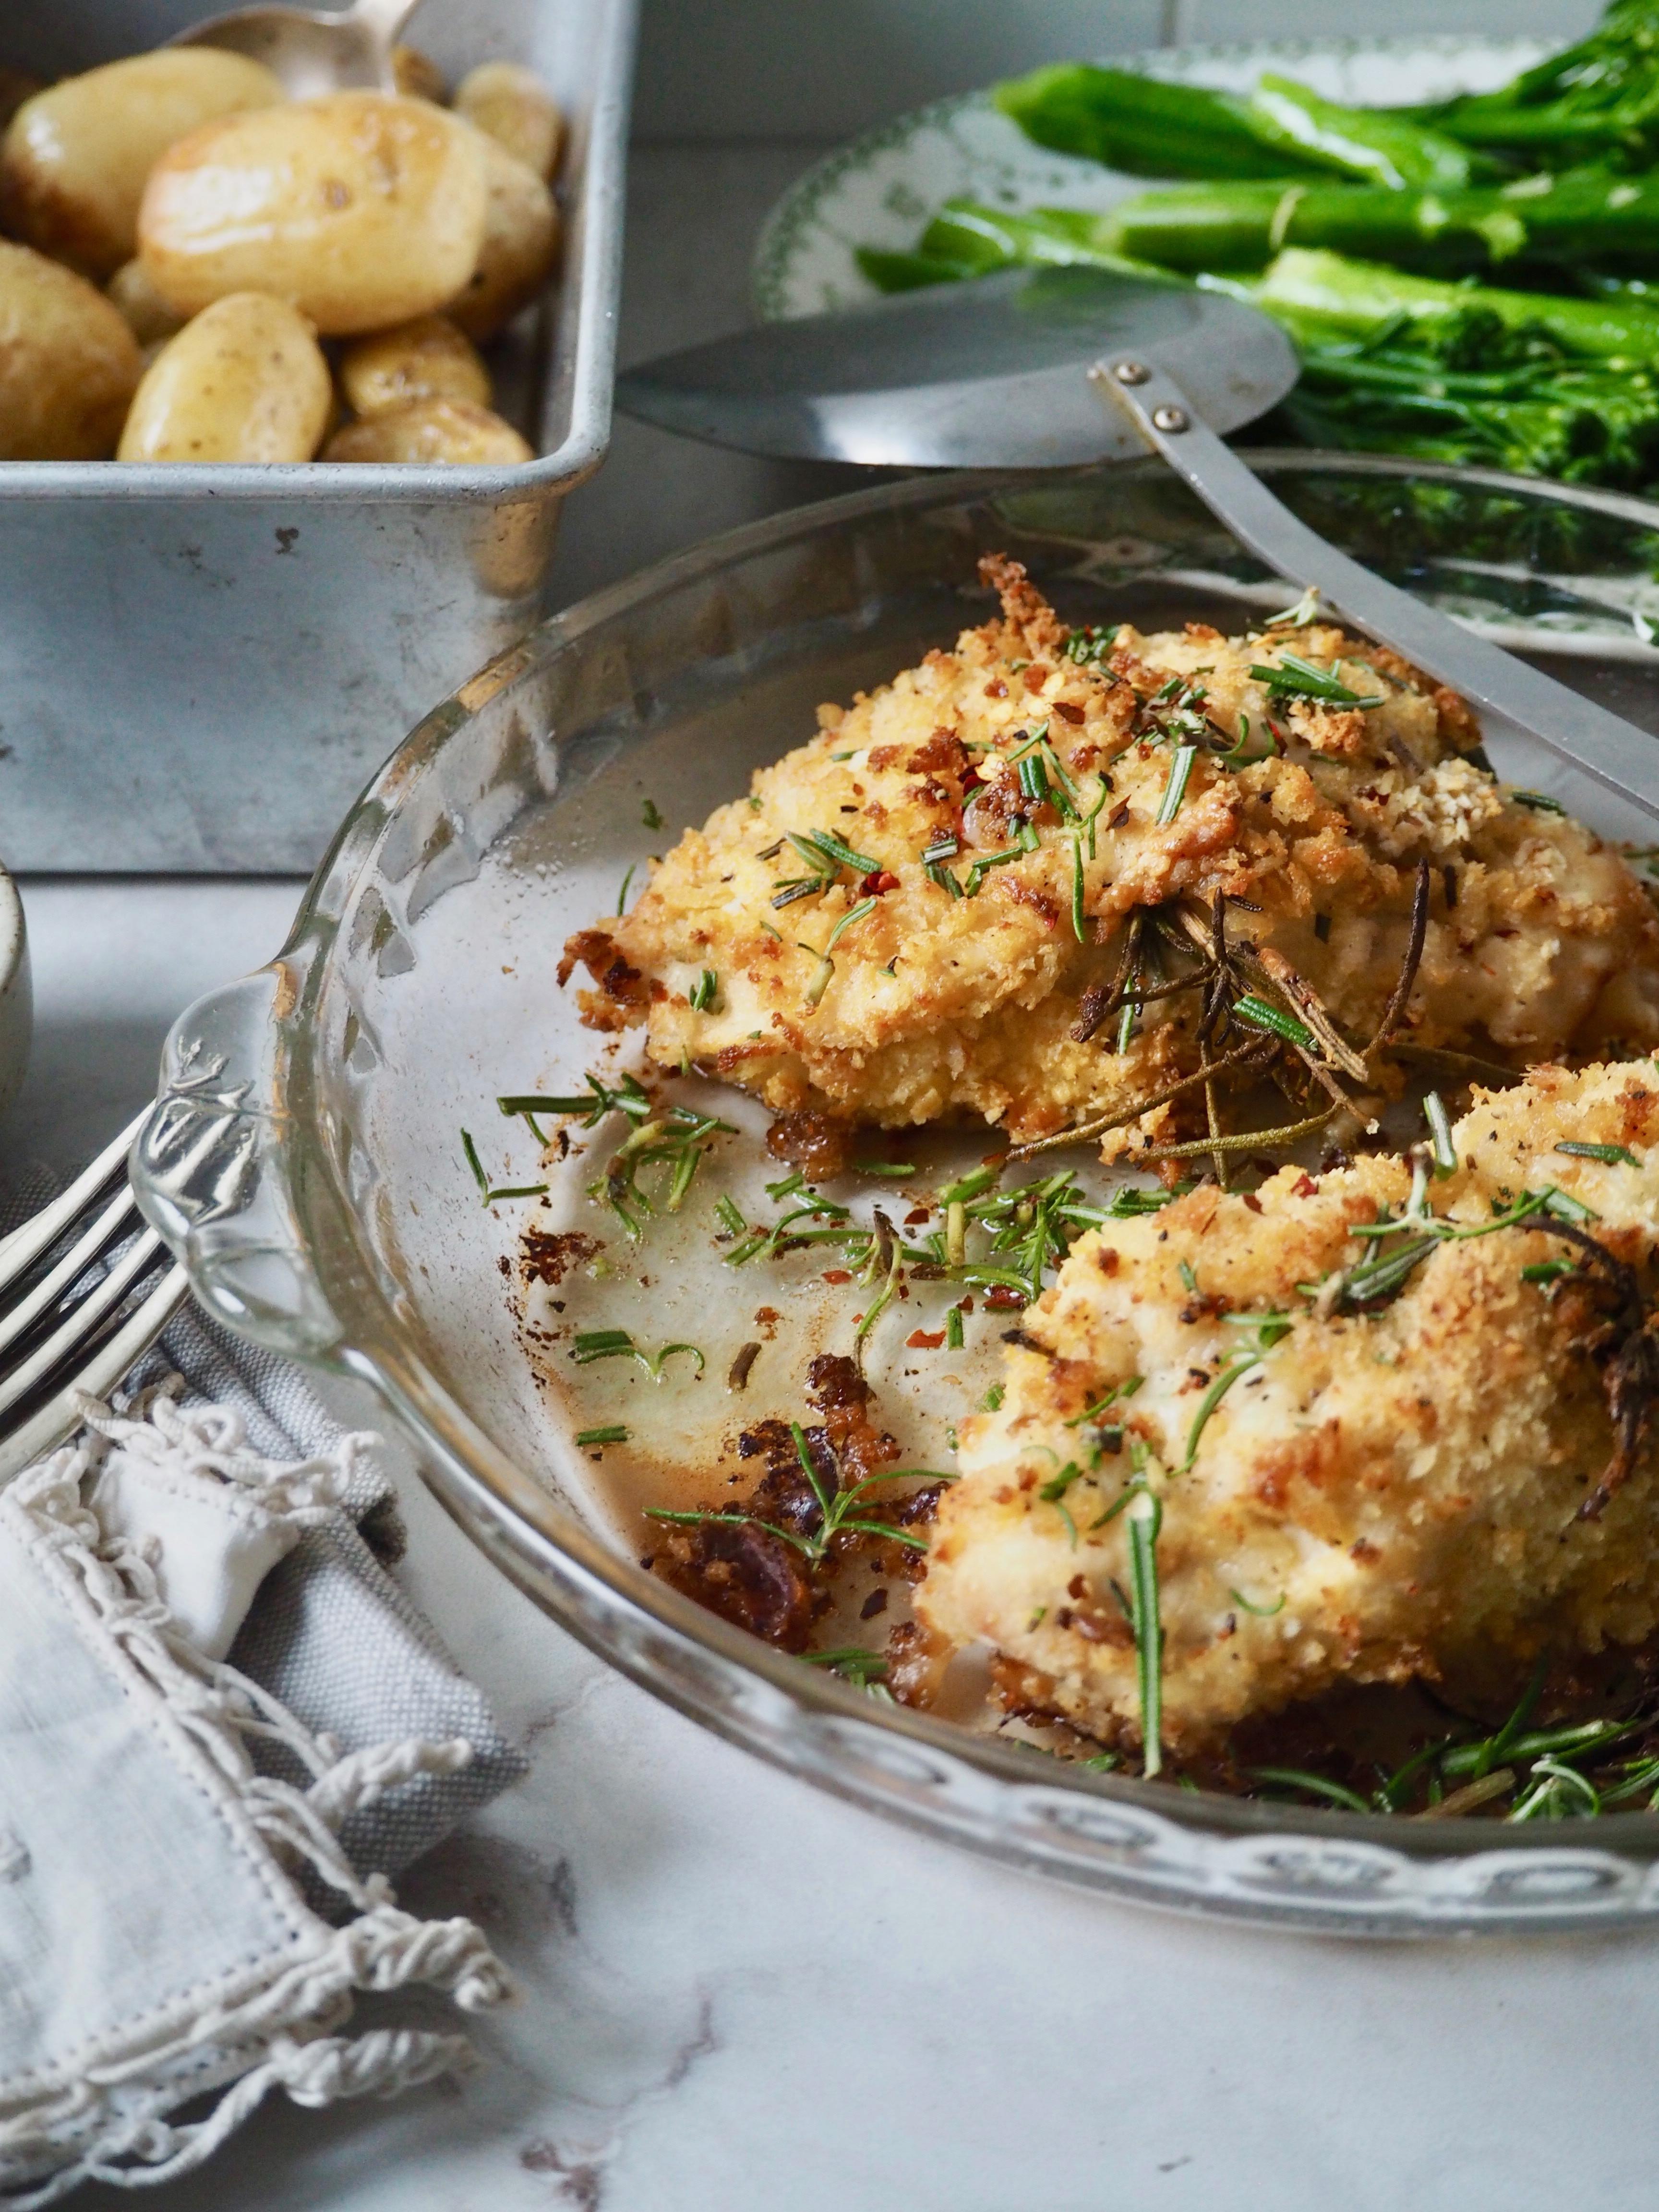 Chicken and Mozzarella Kievs